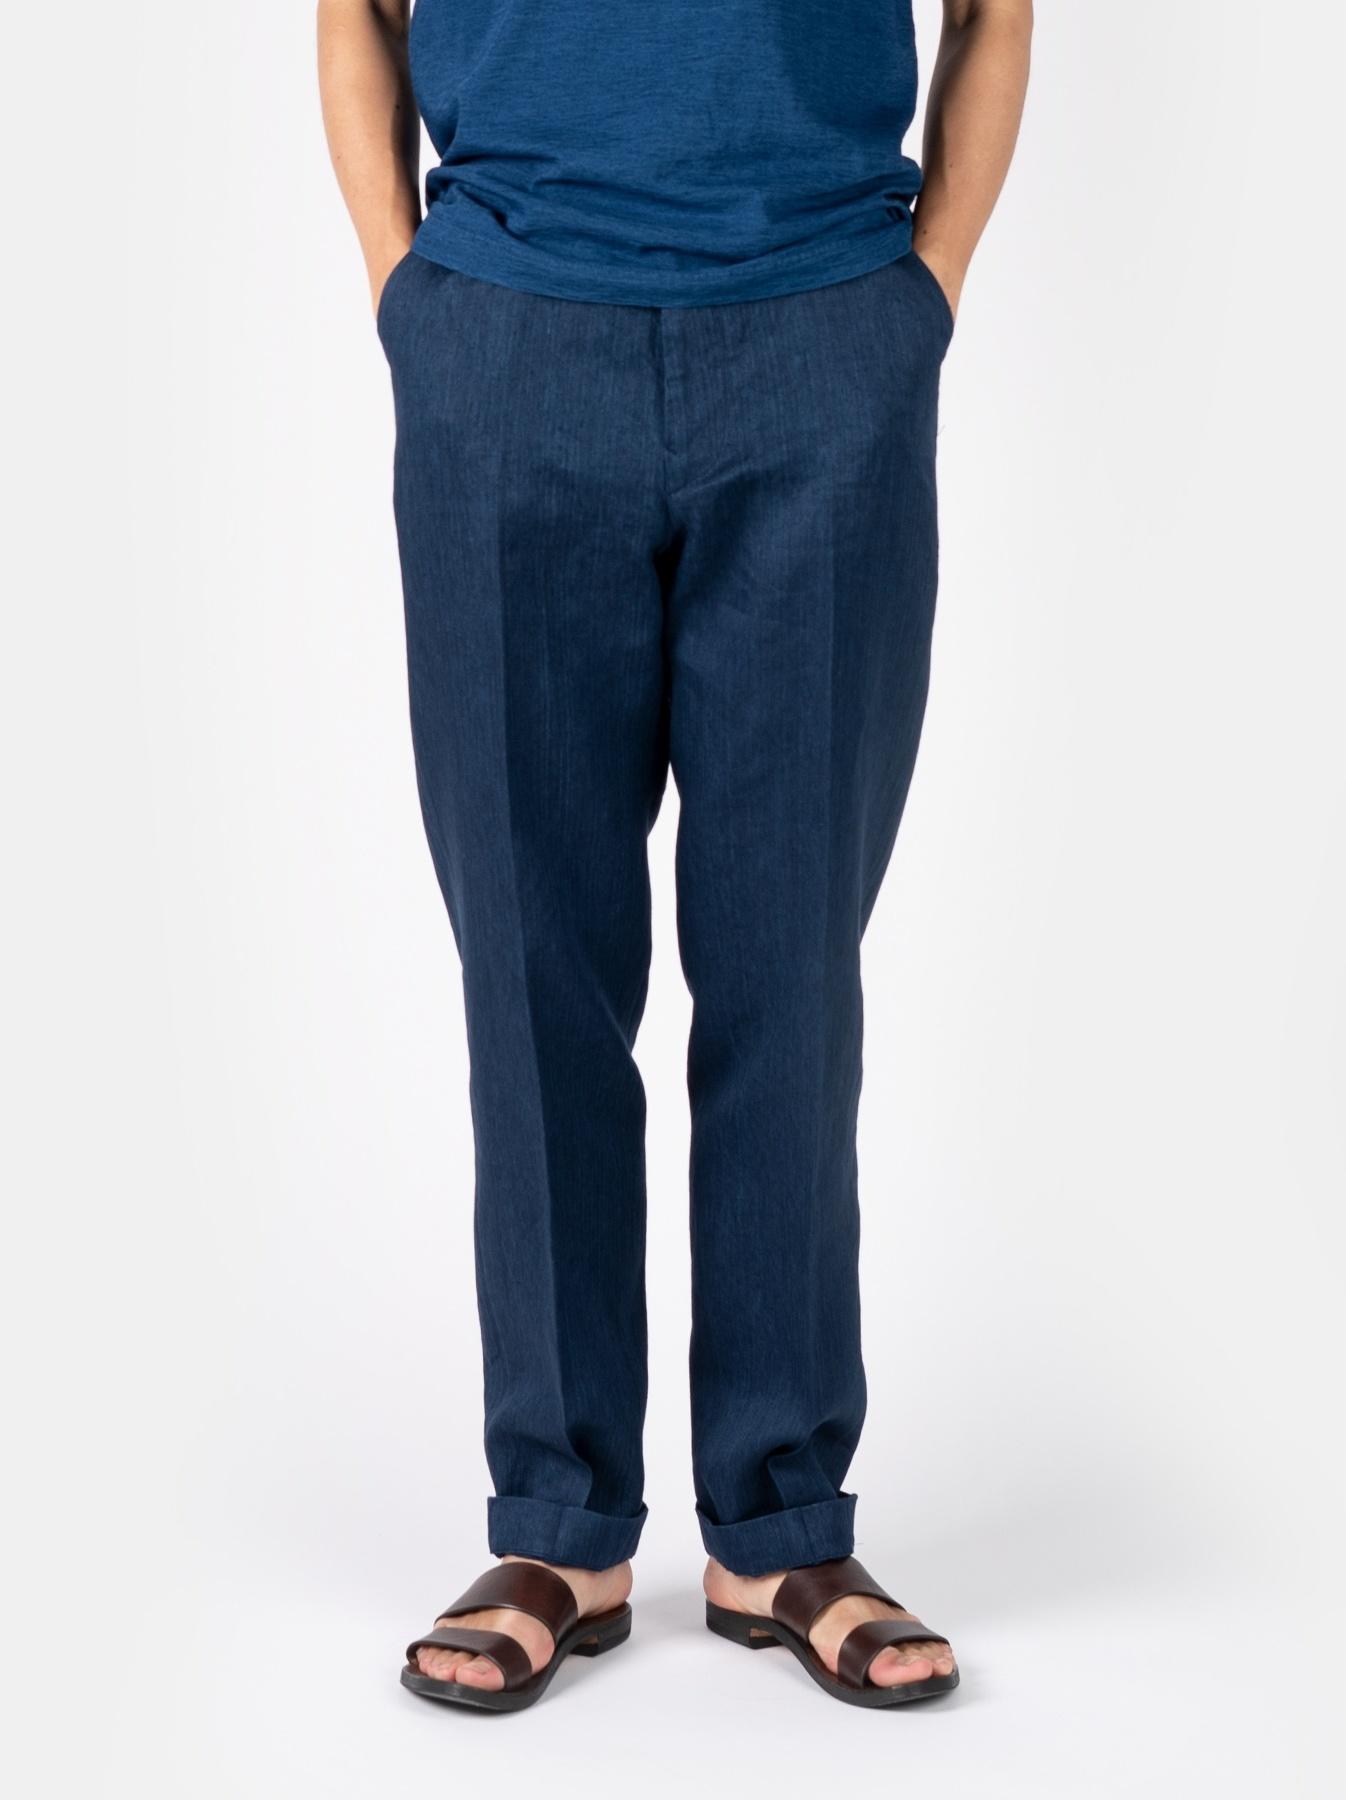 WH Indigo Linen Easy Slacks-3